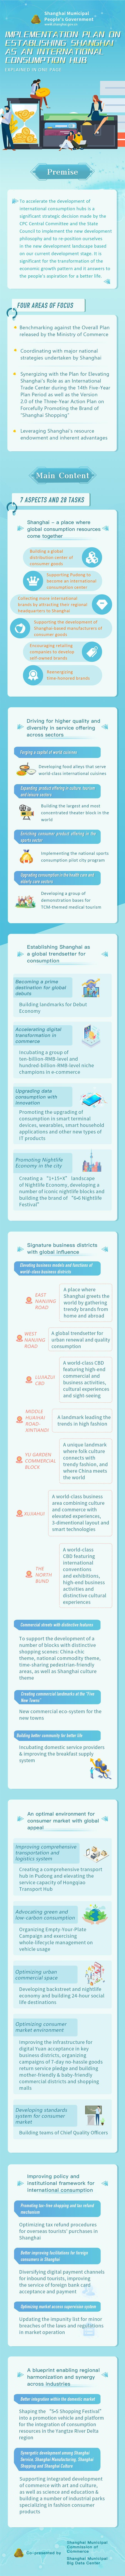 Blueprint for establishing Shanghai as international consumption hub